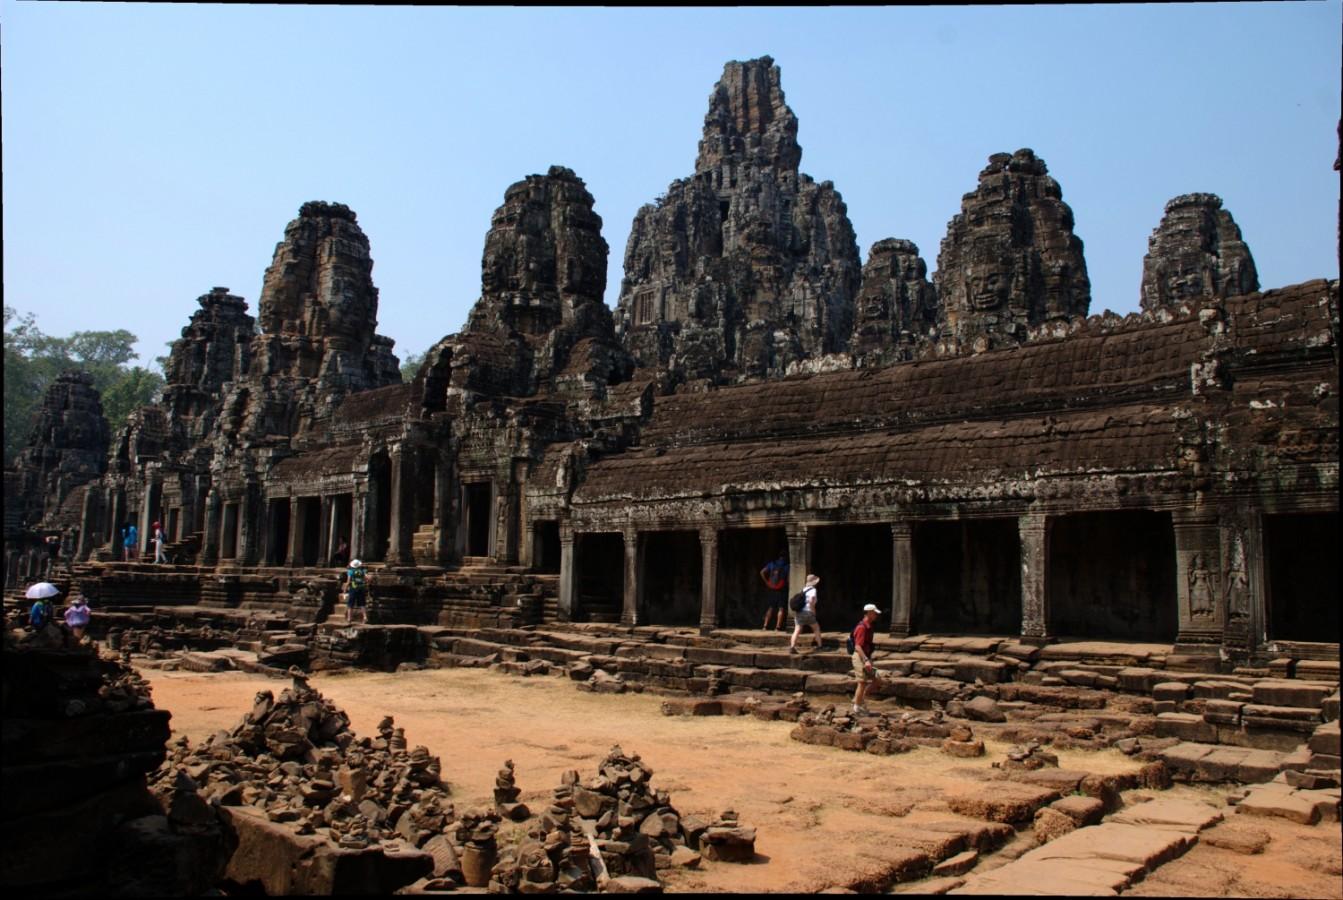 Ősi templomváros Kambodzsában - Angkor két keréken